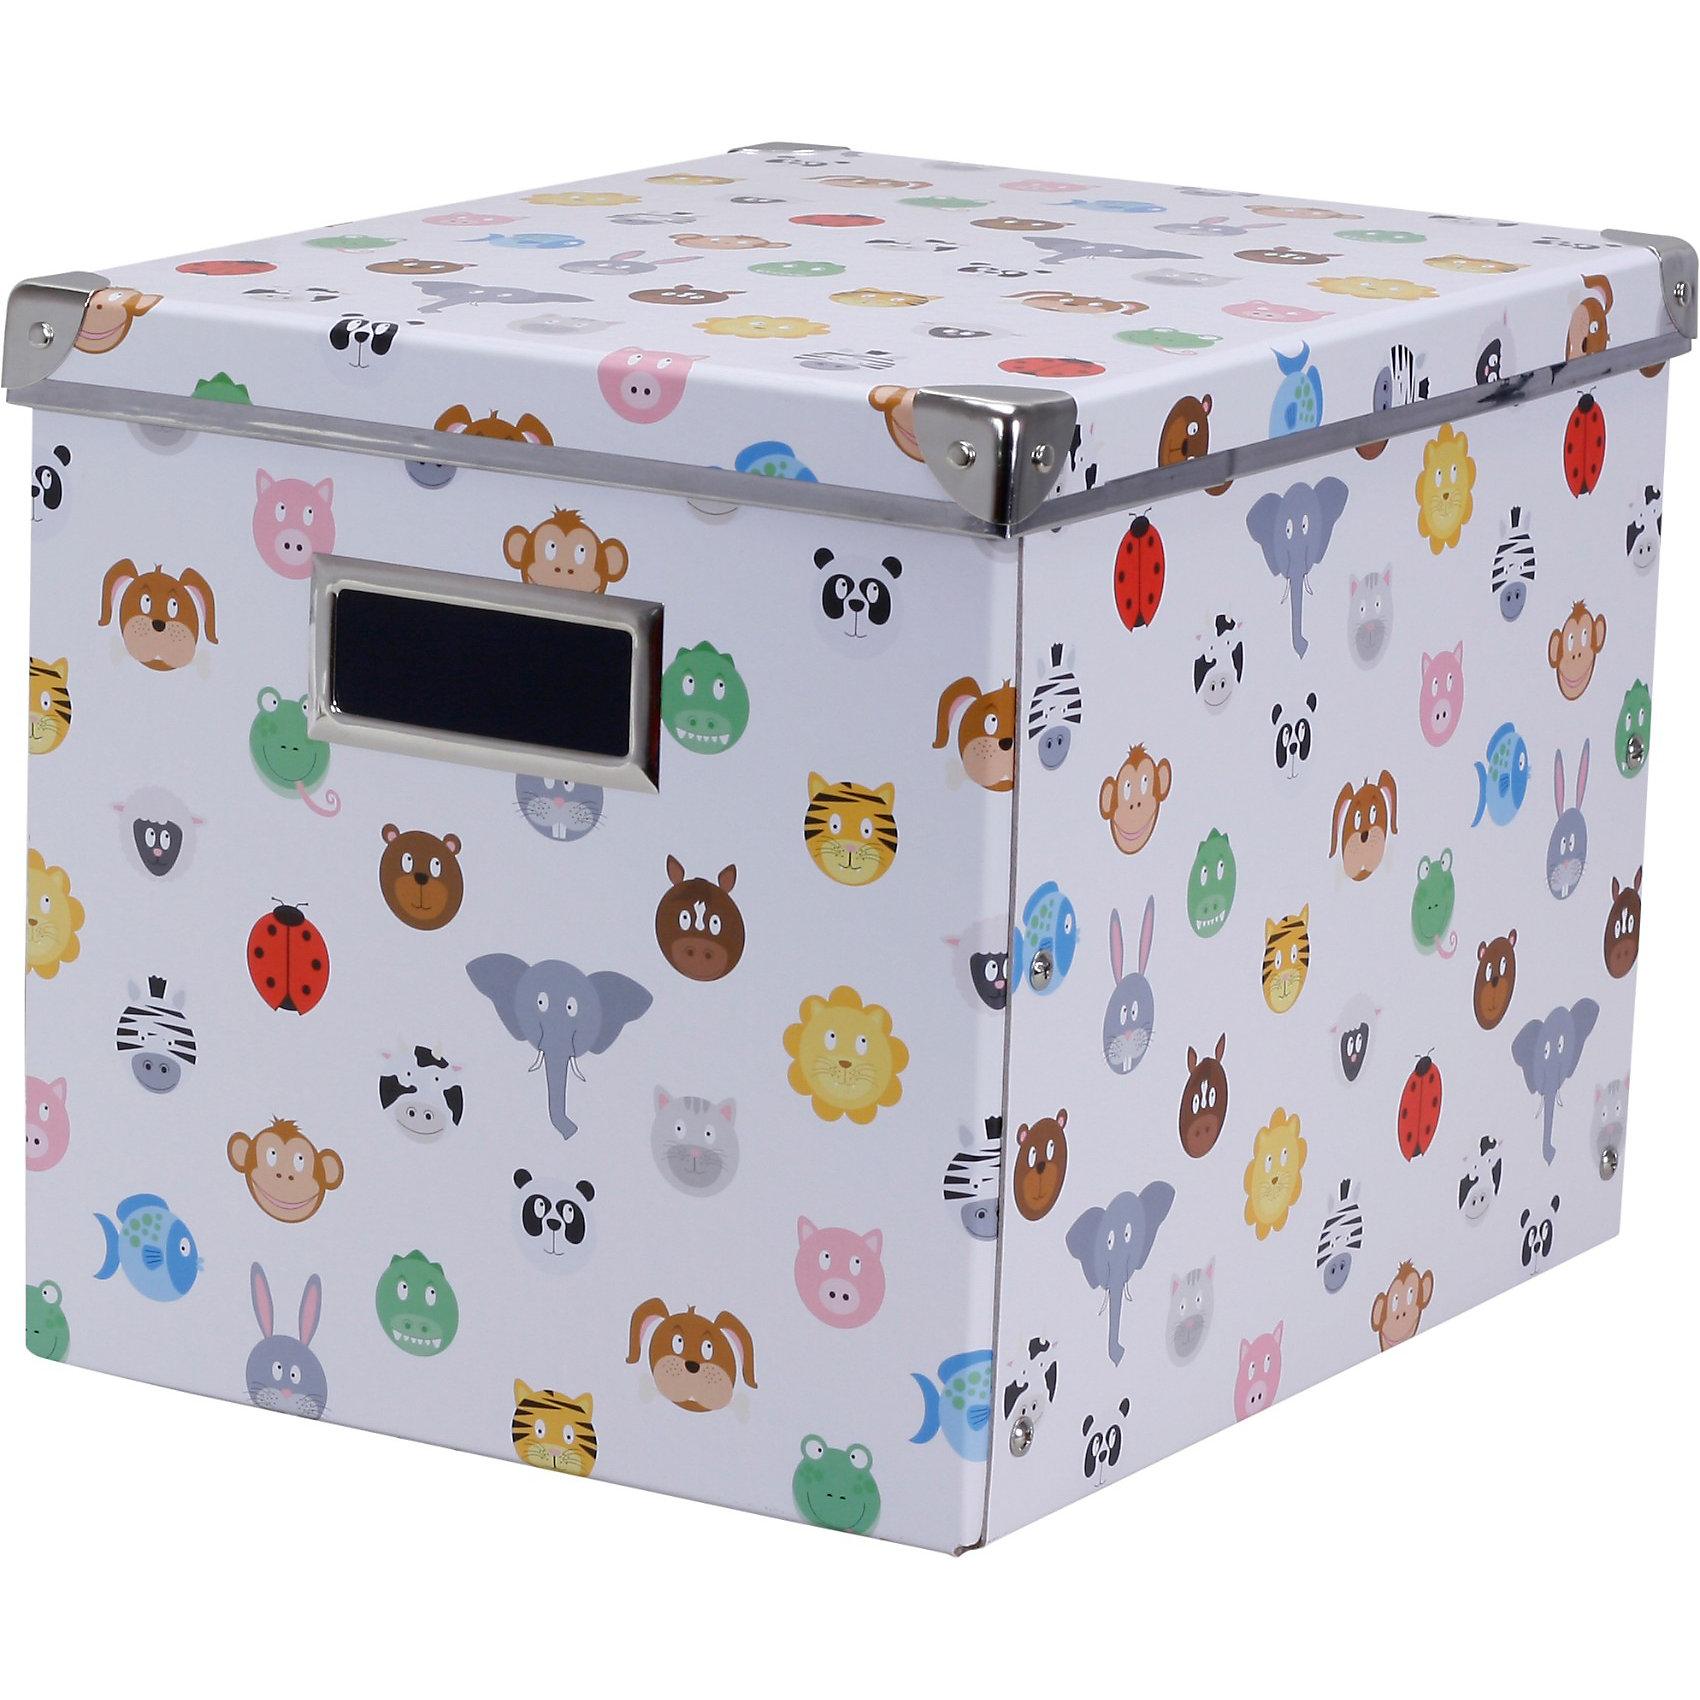 moebel aufbewahrungsboxen b2b trade. Black Bedroom Furniture Sets. Home Design Ideas